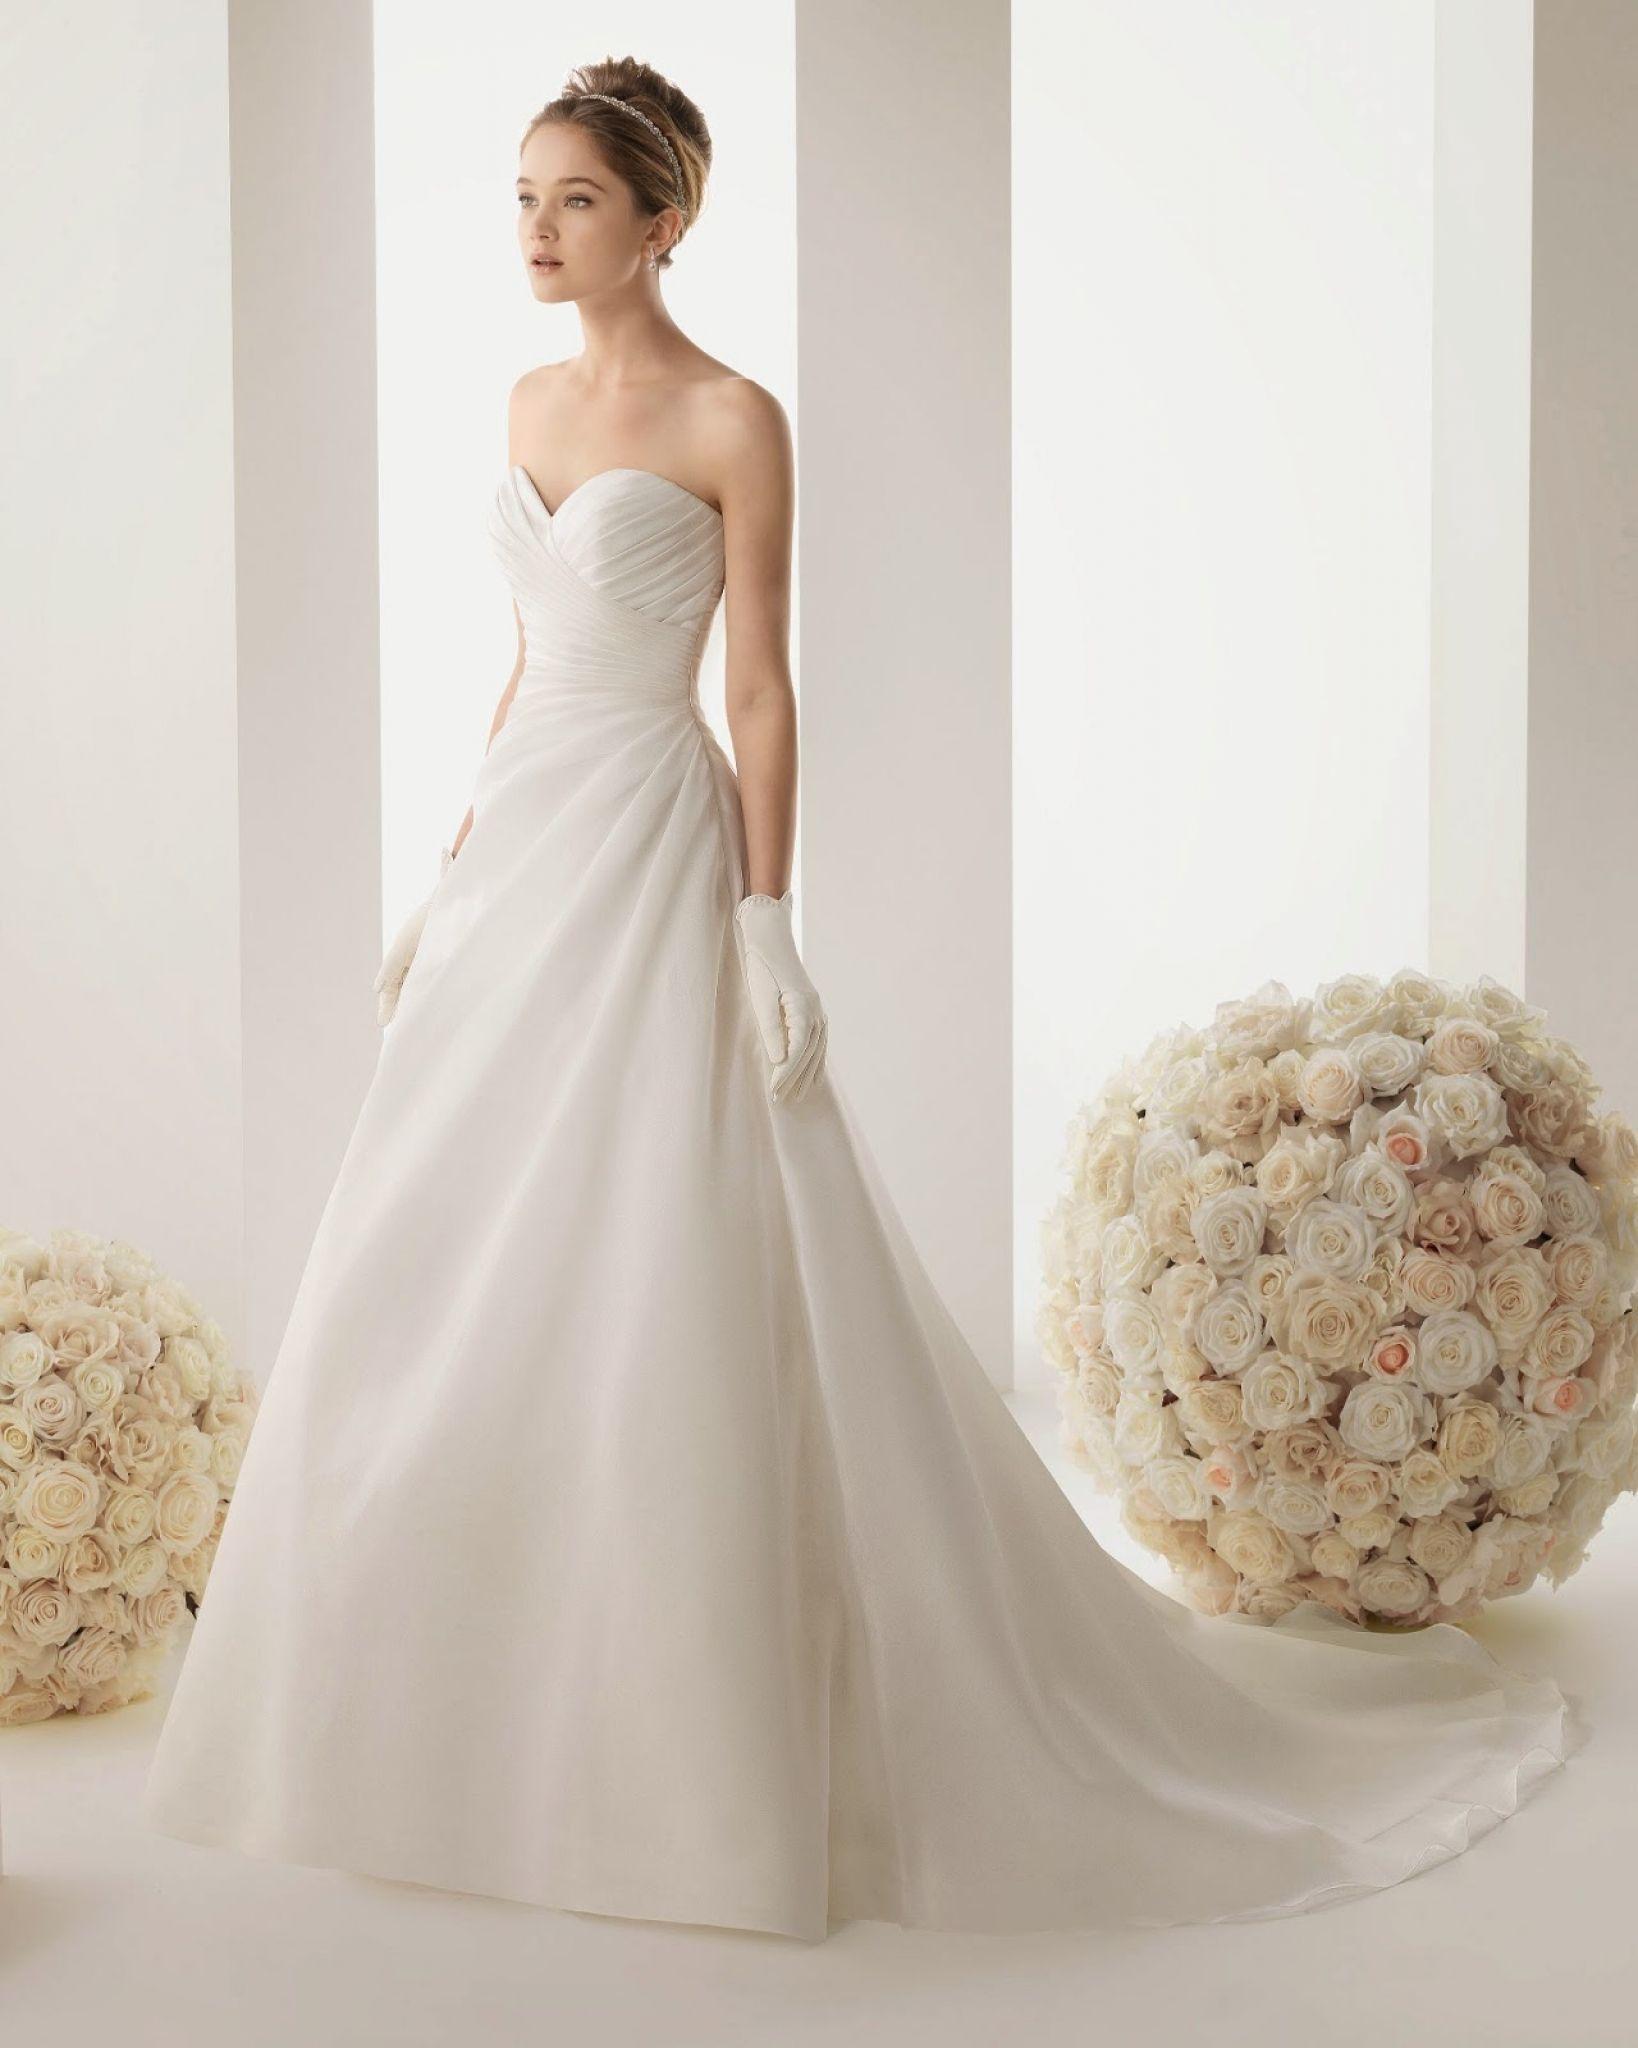 NYC Rent a Wedding Dress